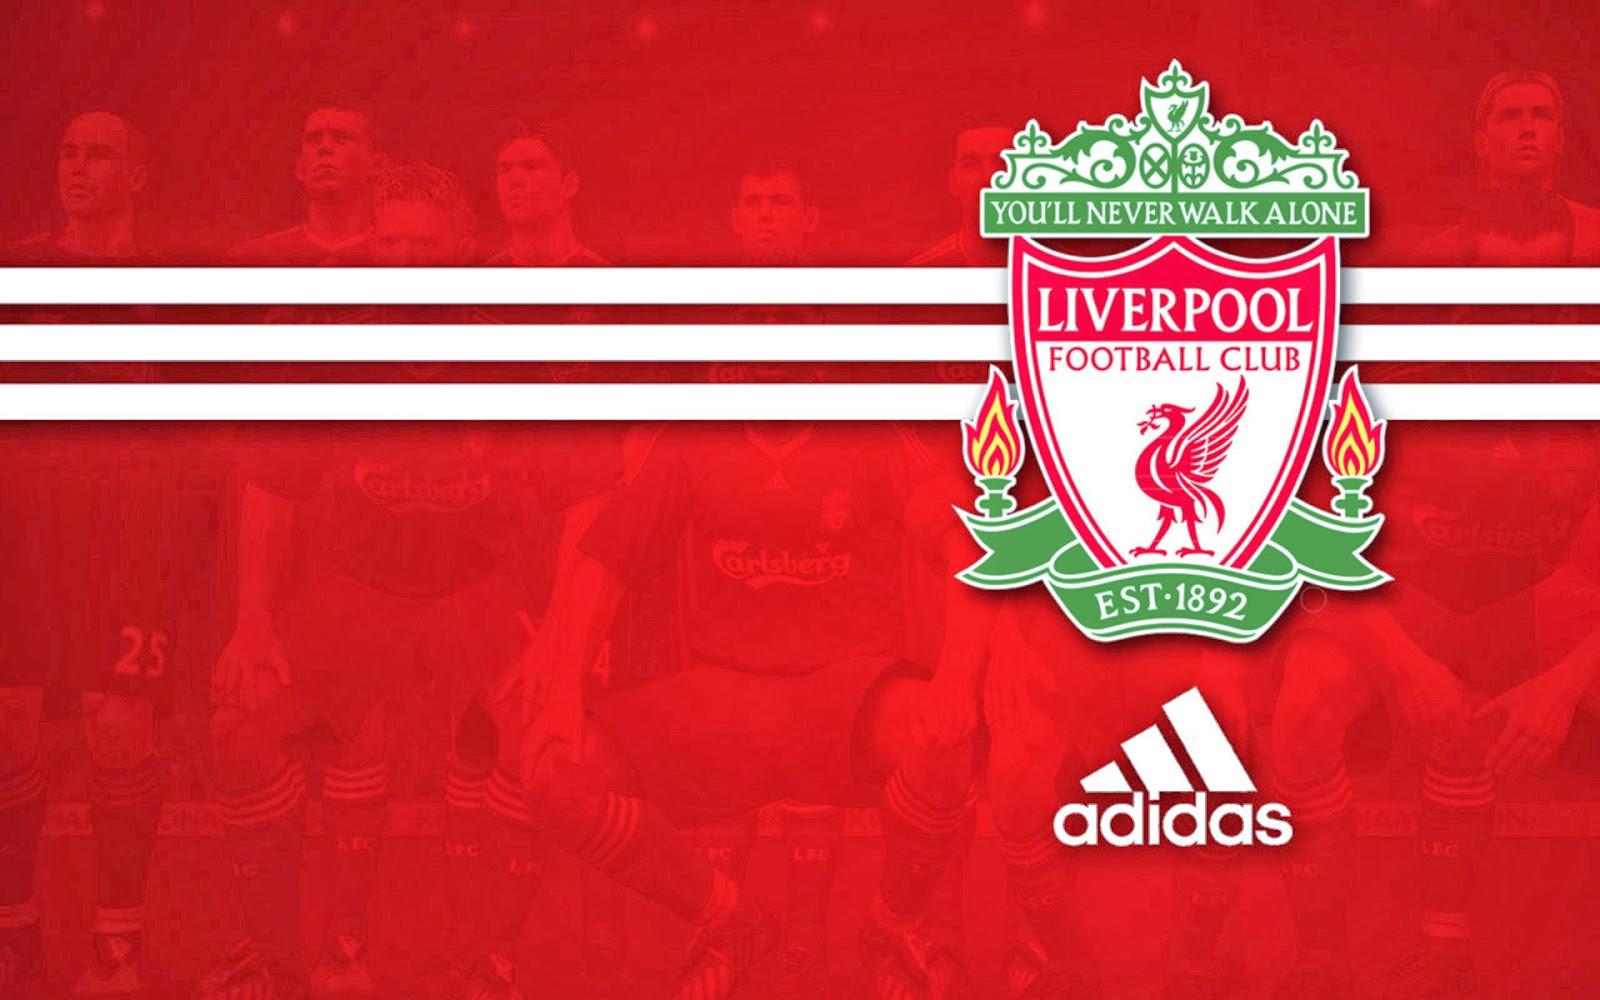 FC Liverpool 2015 WallpaperSafari on [47+] Wallpaper